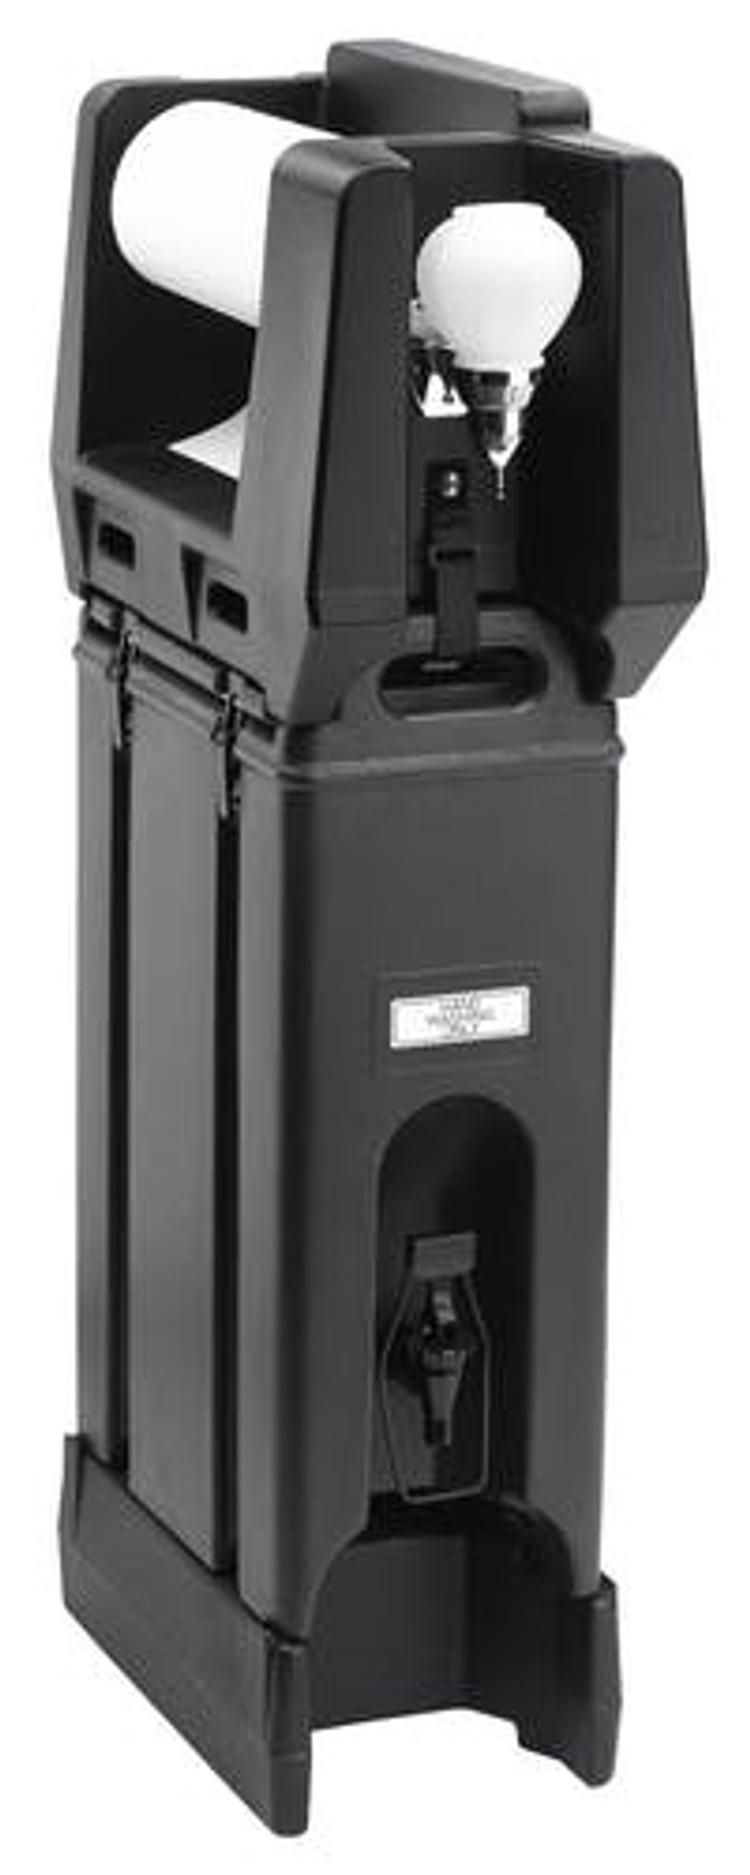 Cambro Insulated Beverage Dispensers